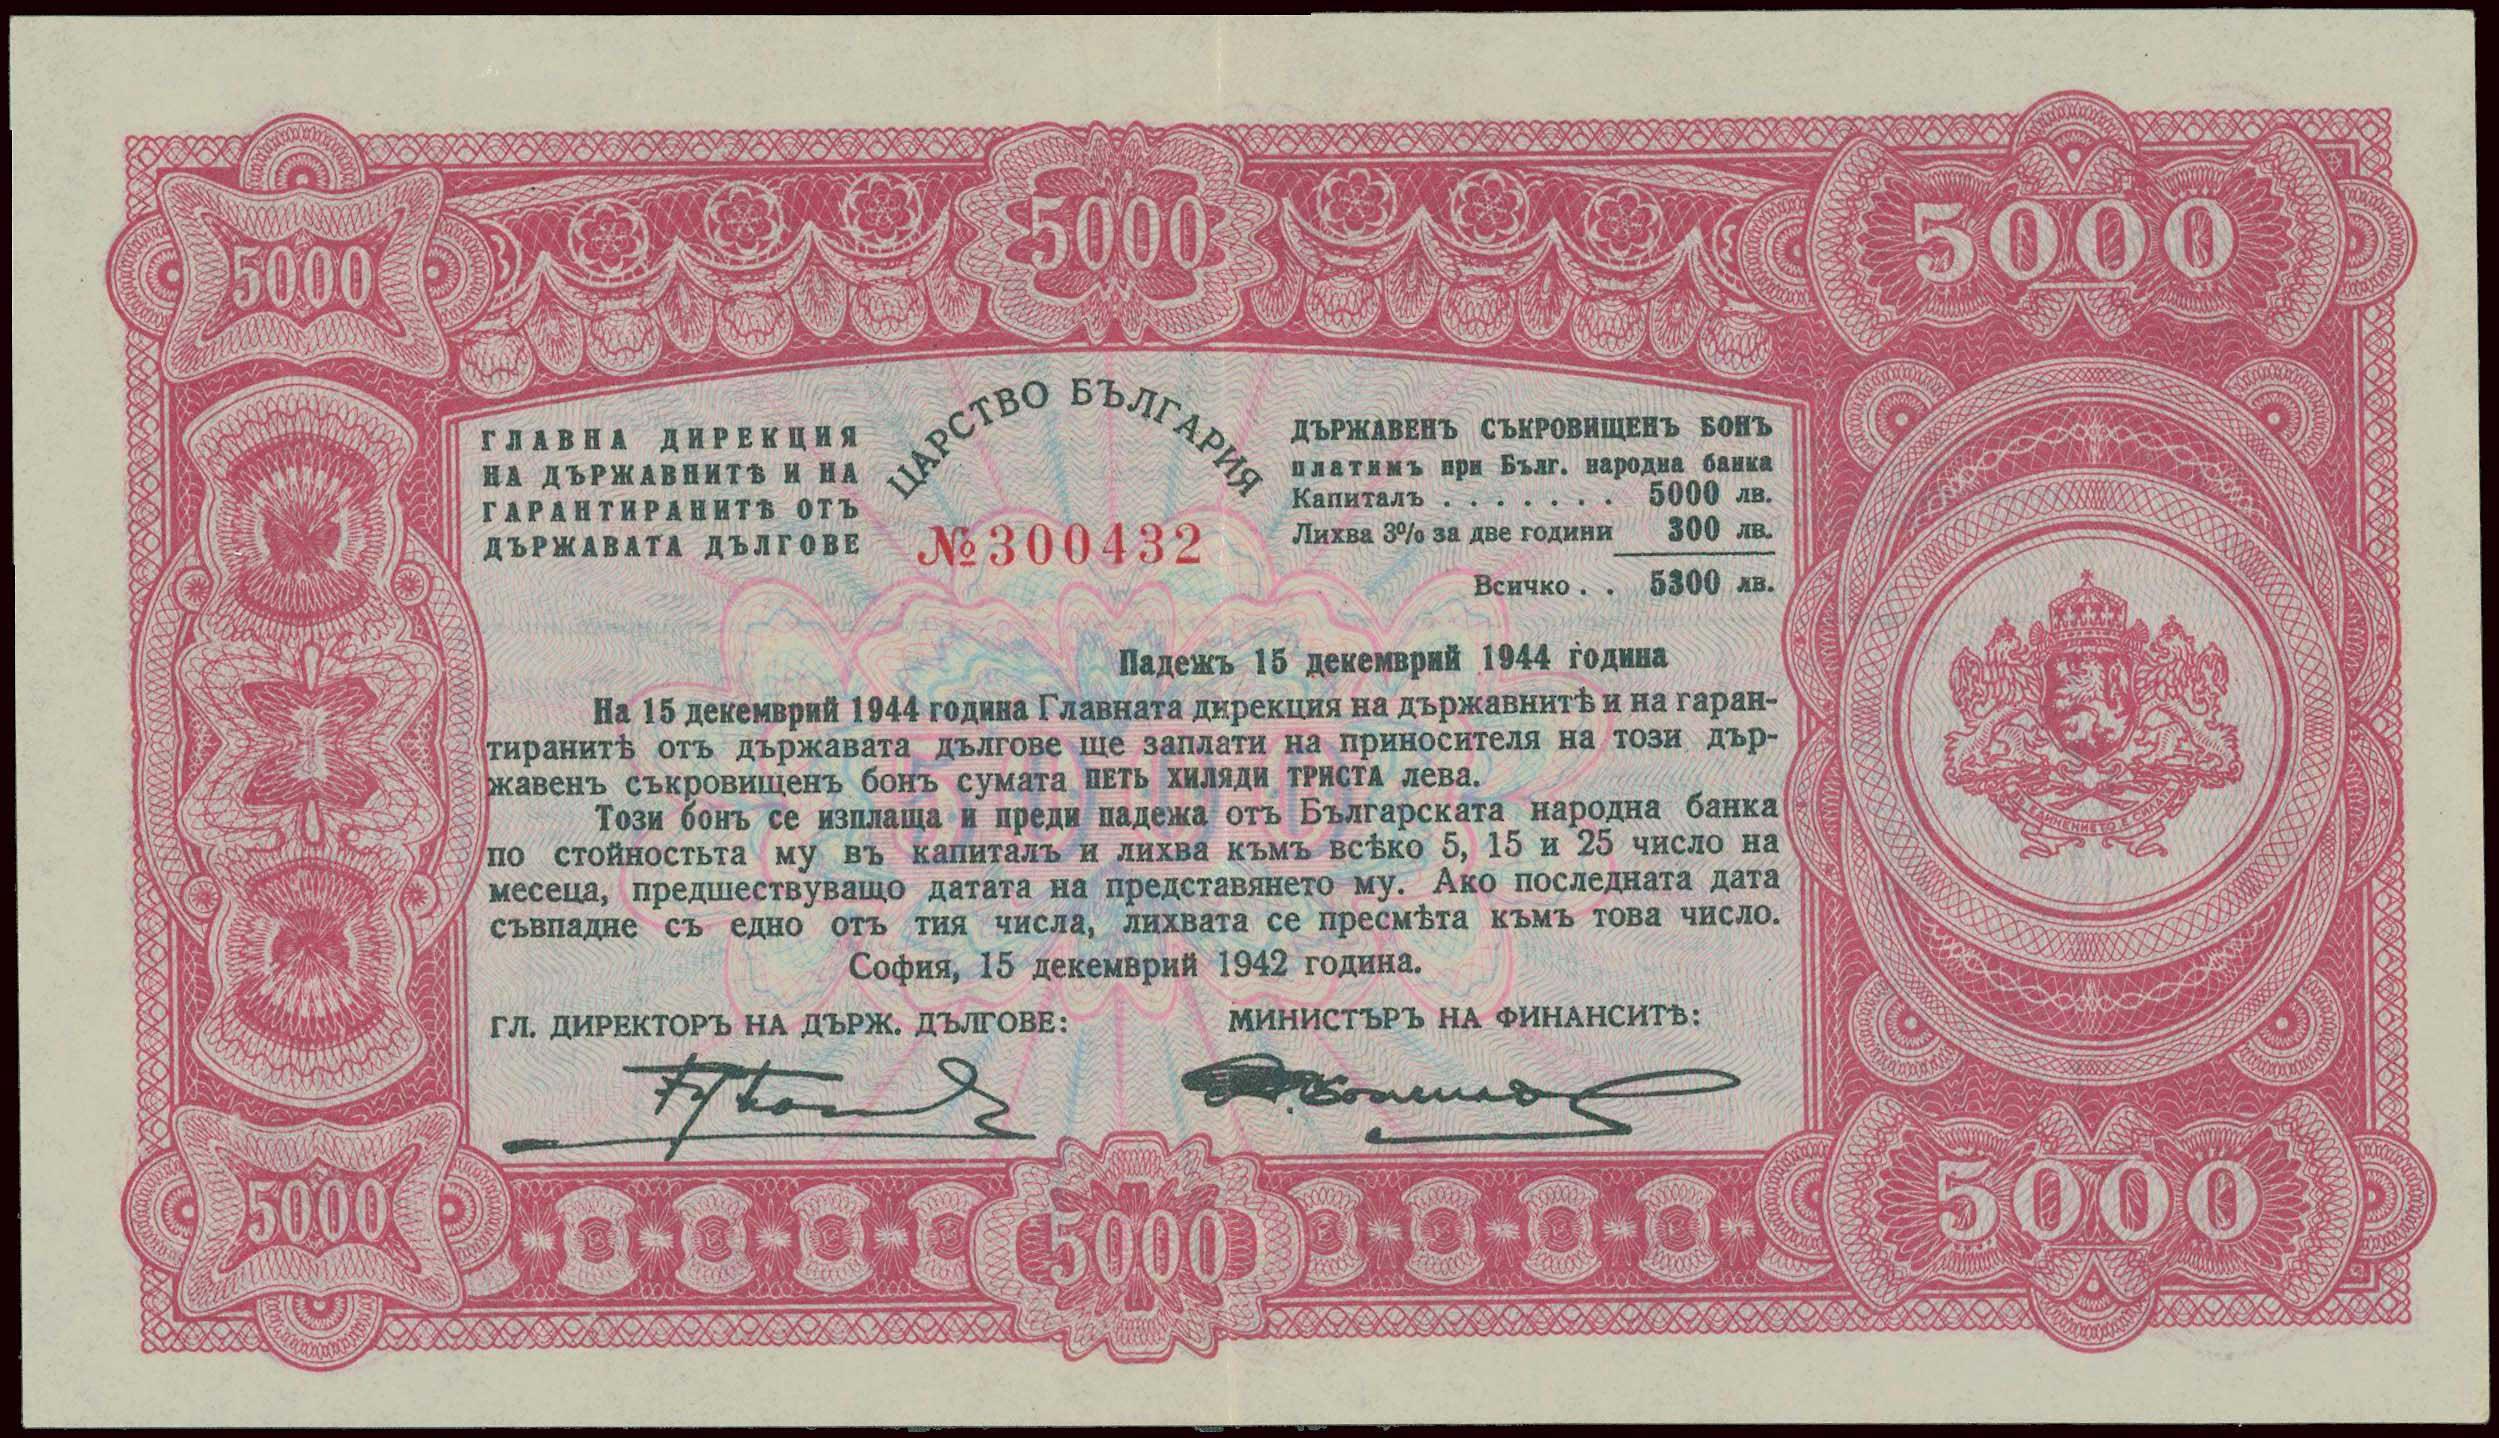 Lot 6670 - -  PAPER MONEY - BANKNOTES BULGARIAN OCCUPATION -  A. Karamitsos Public & Live Internet Auction 676 Day 1